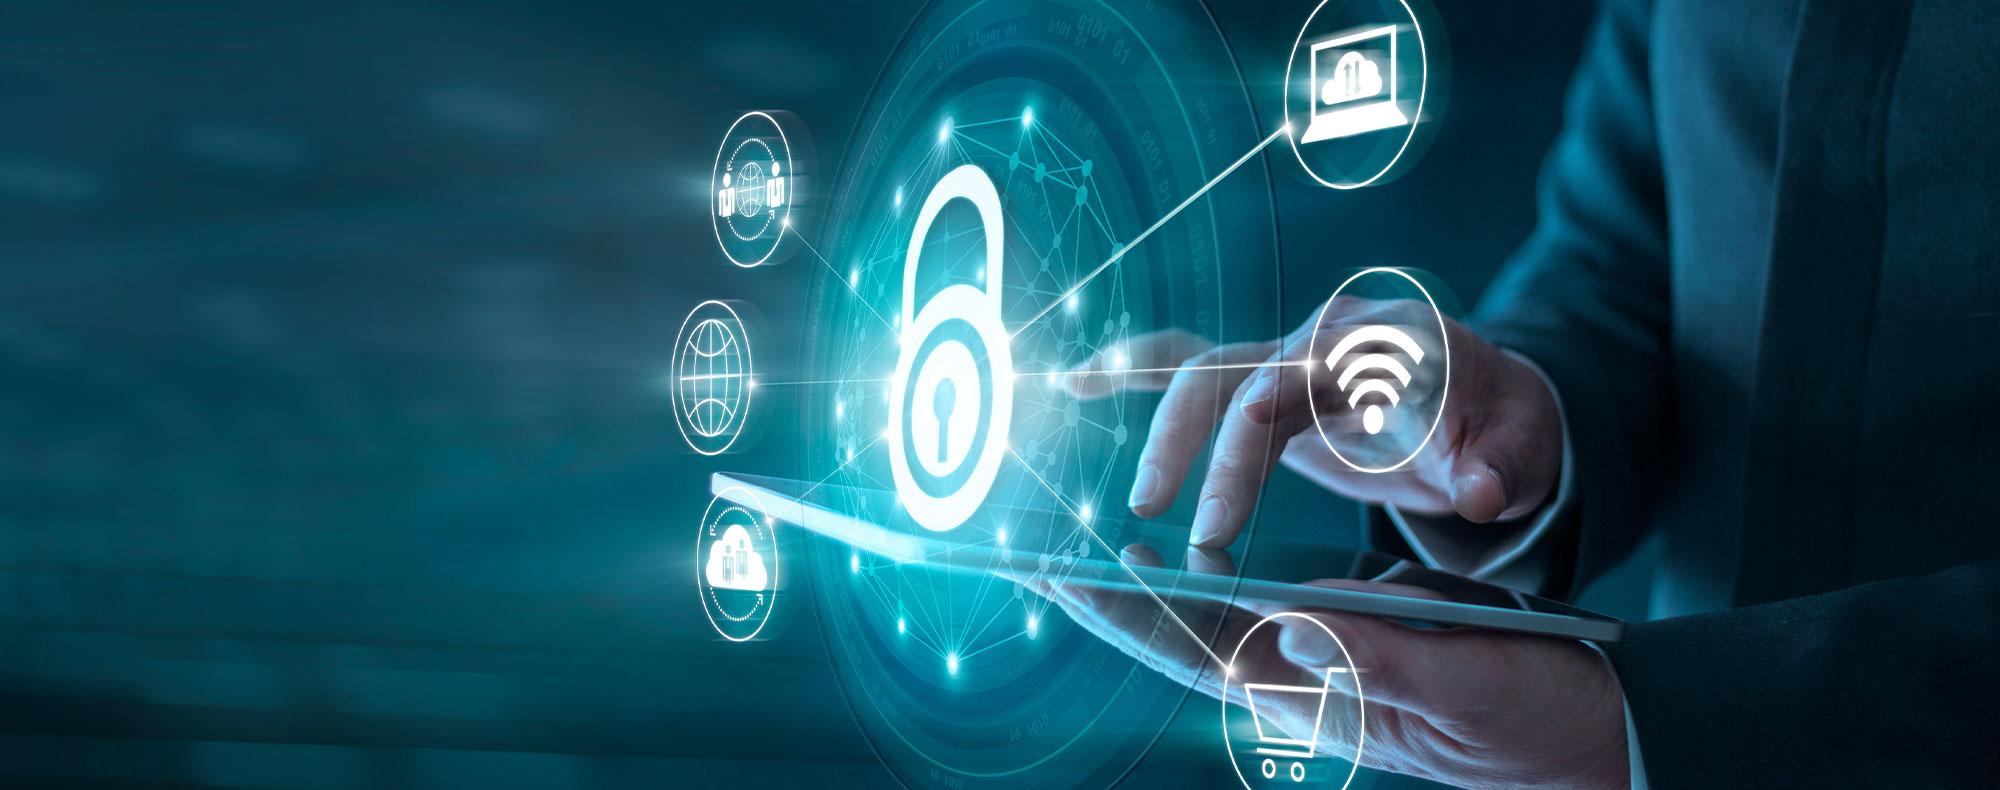 Private Protocol Data Security